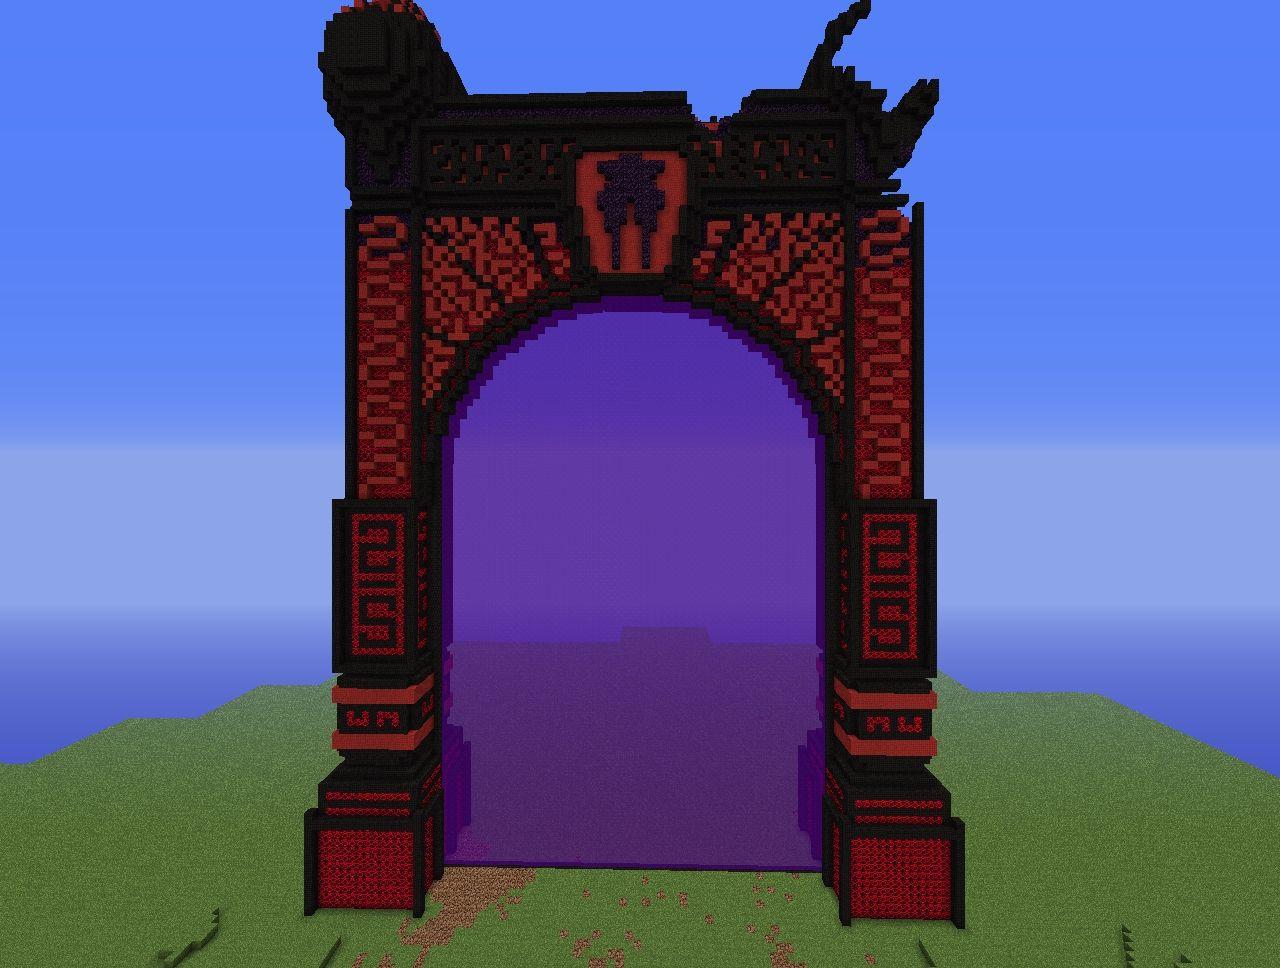 Nether portal minecraft